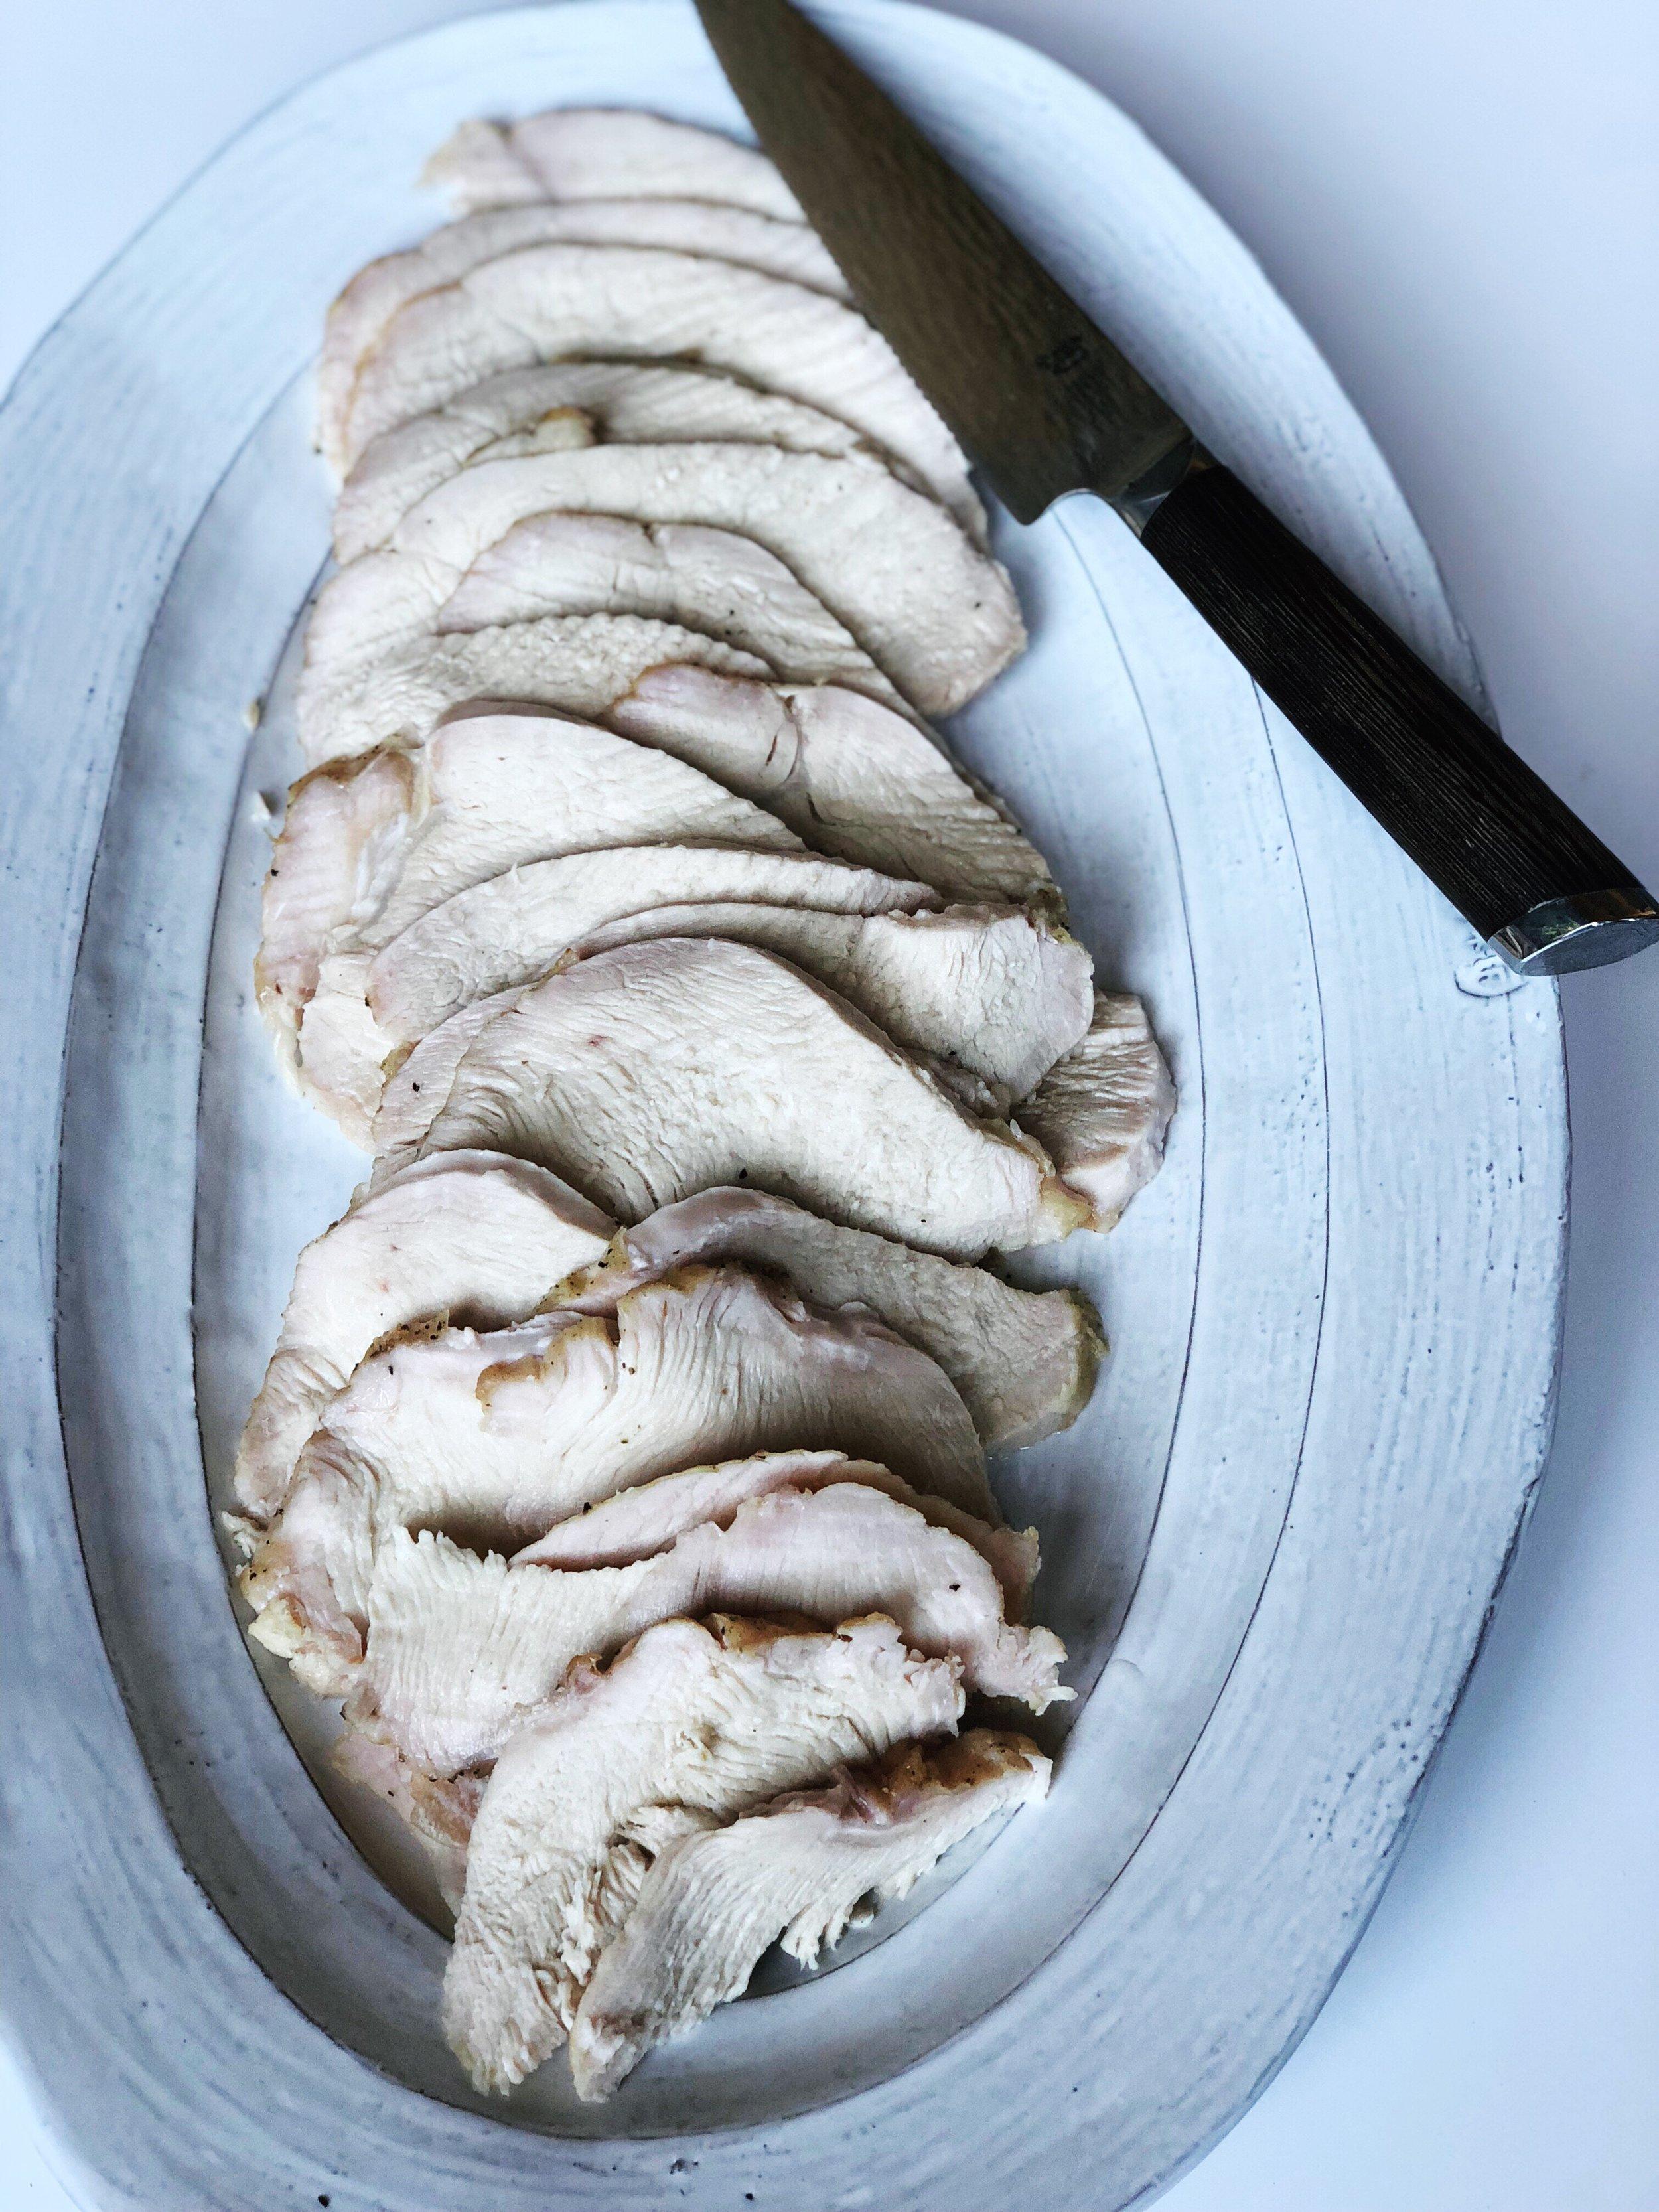 almonds and asana roasted turkey.JPG